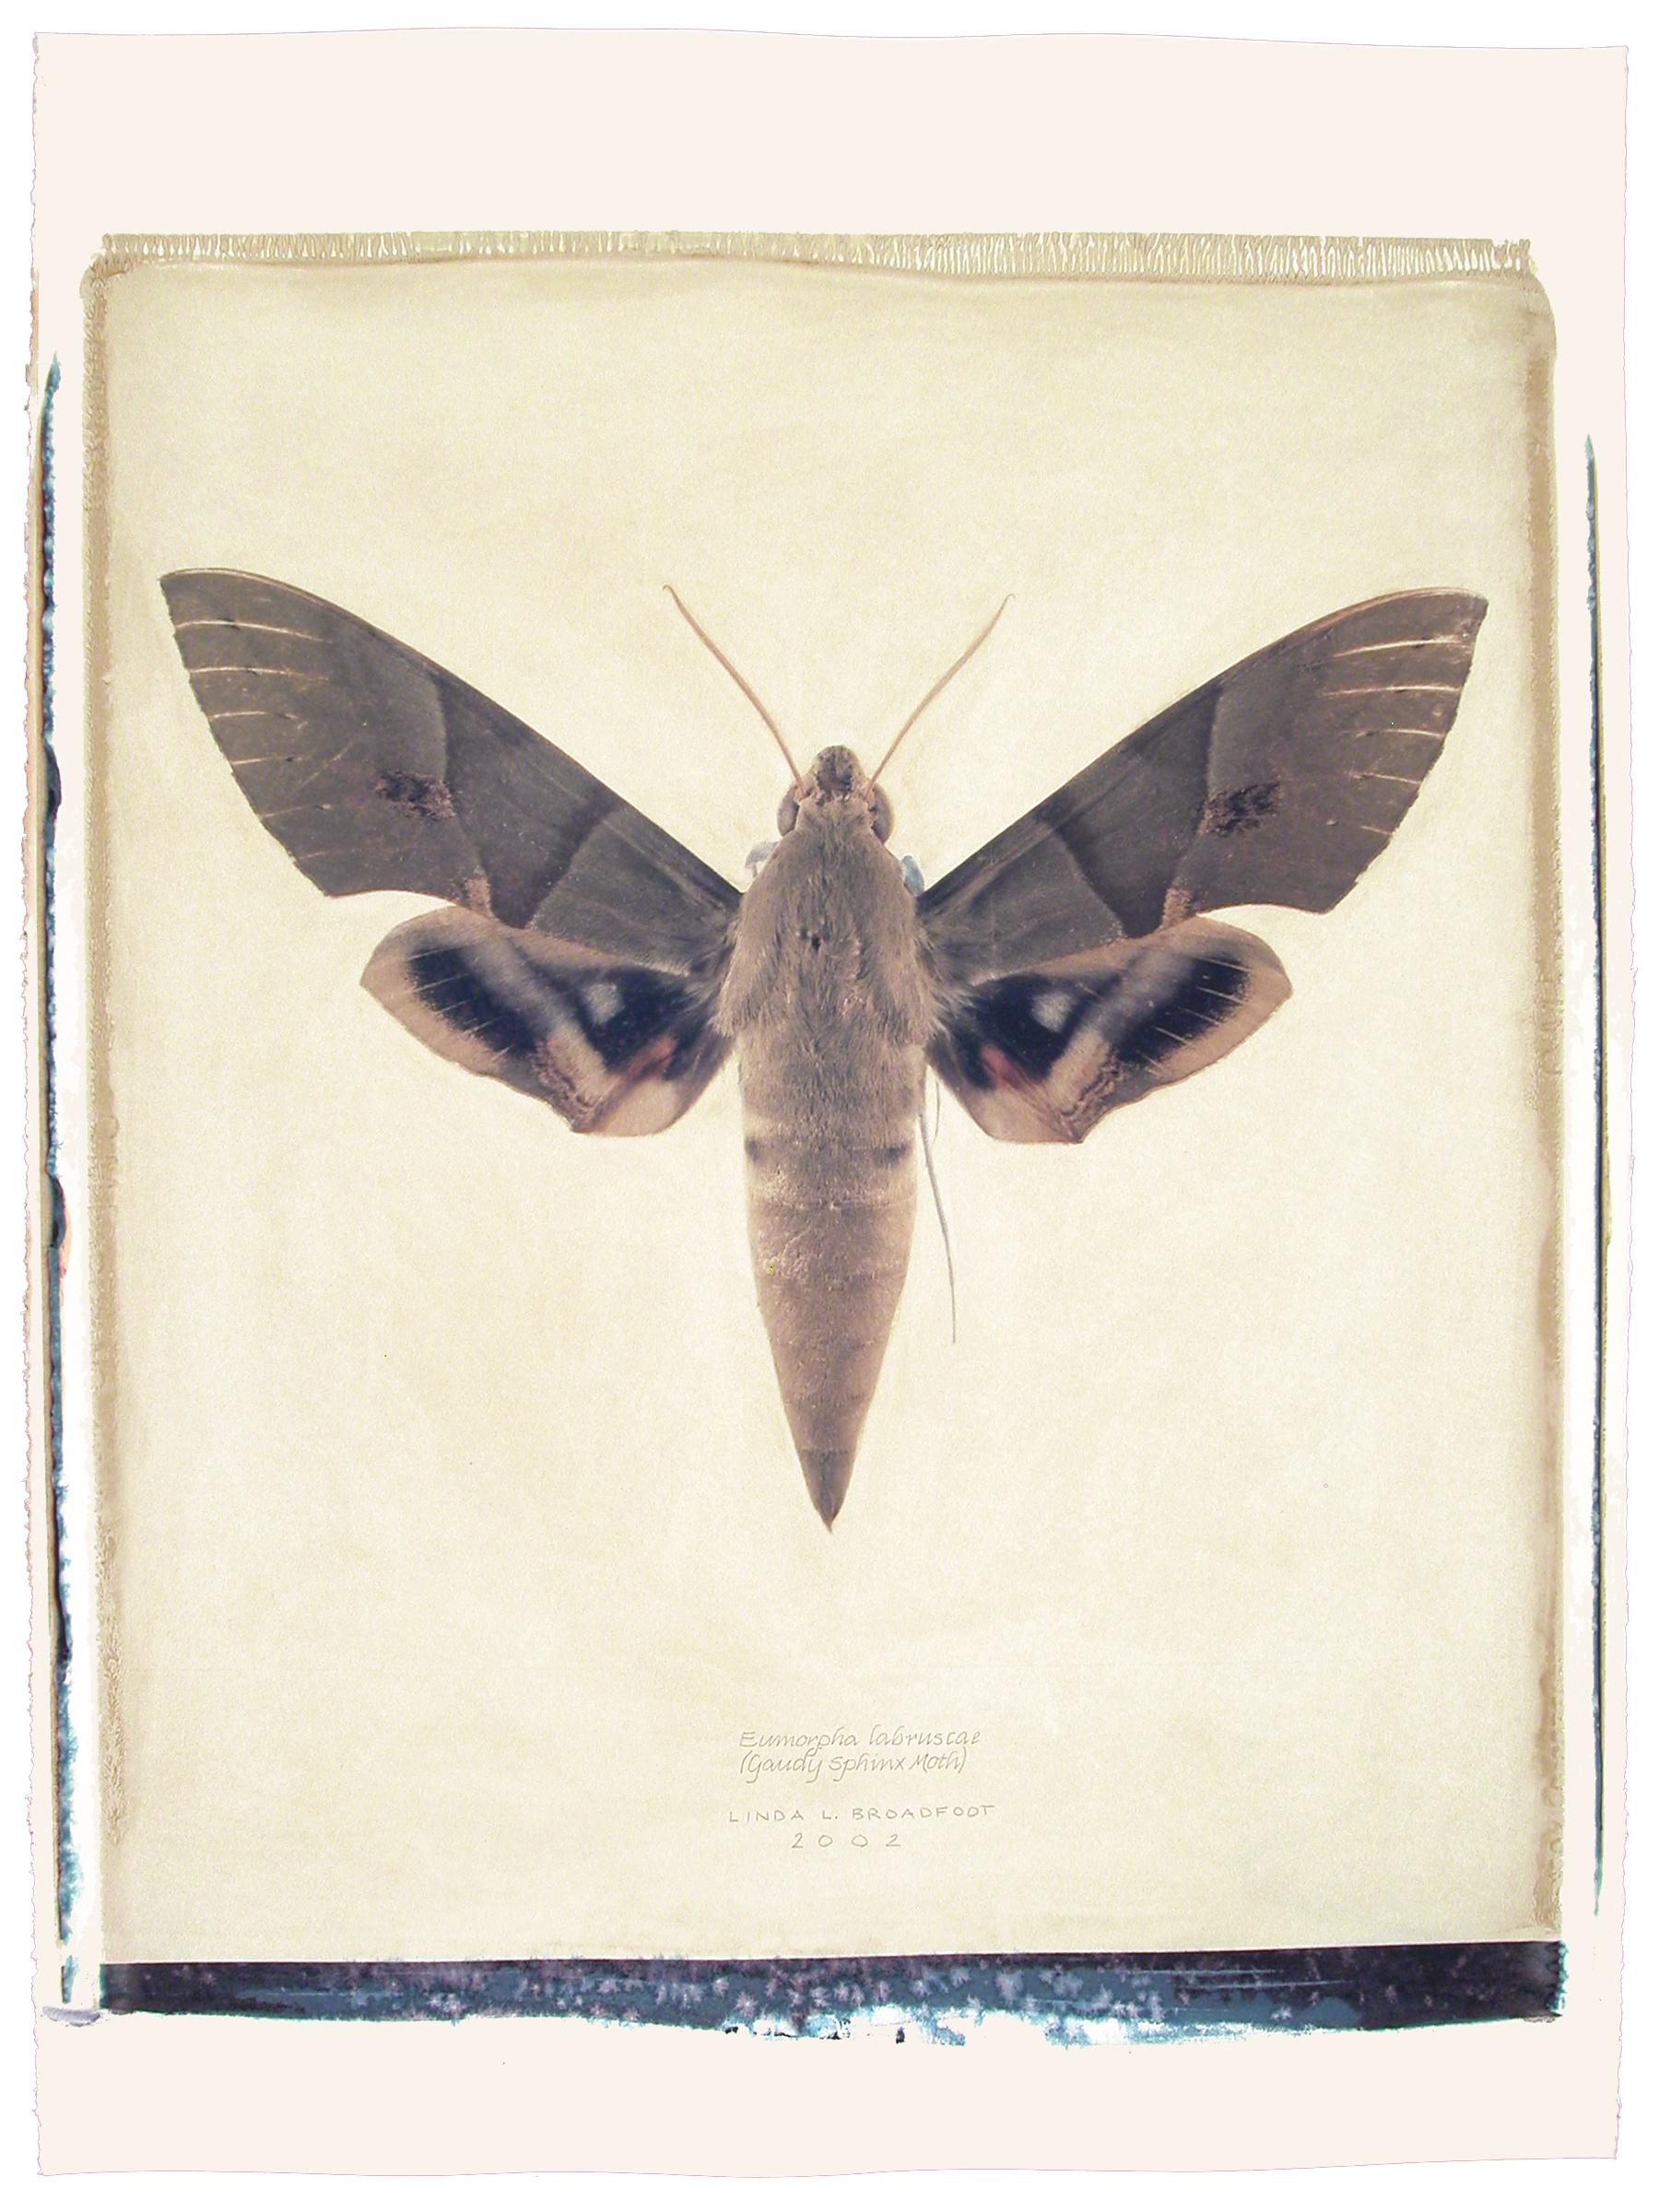 Eumorpha labruscae  (Gaudy Sphinx Moth), 2002